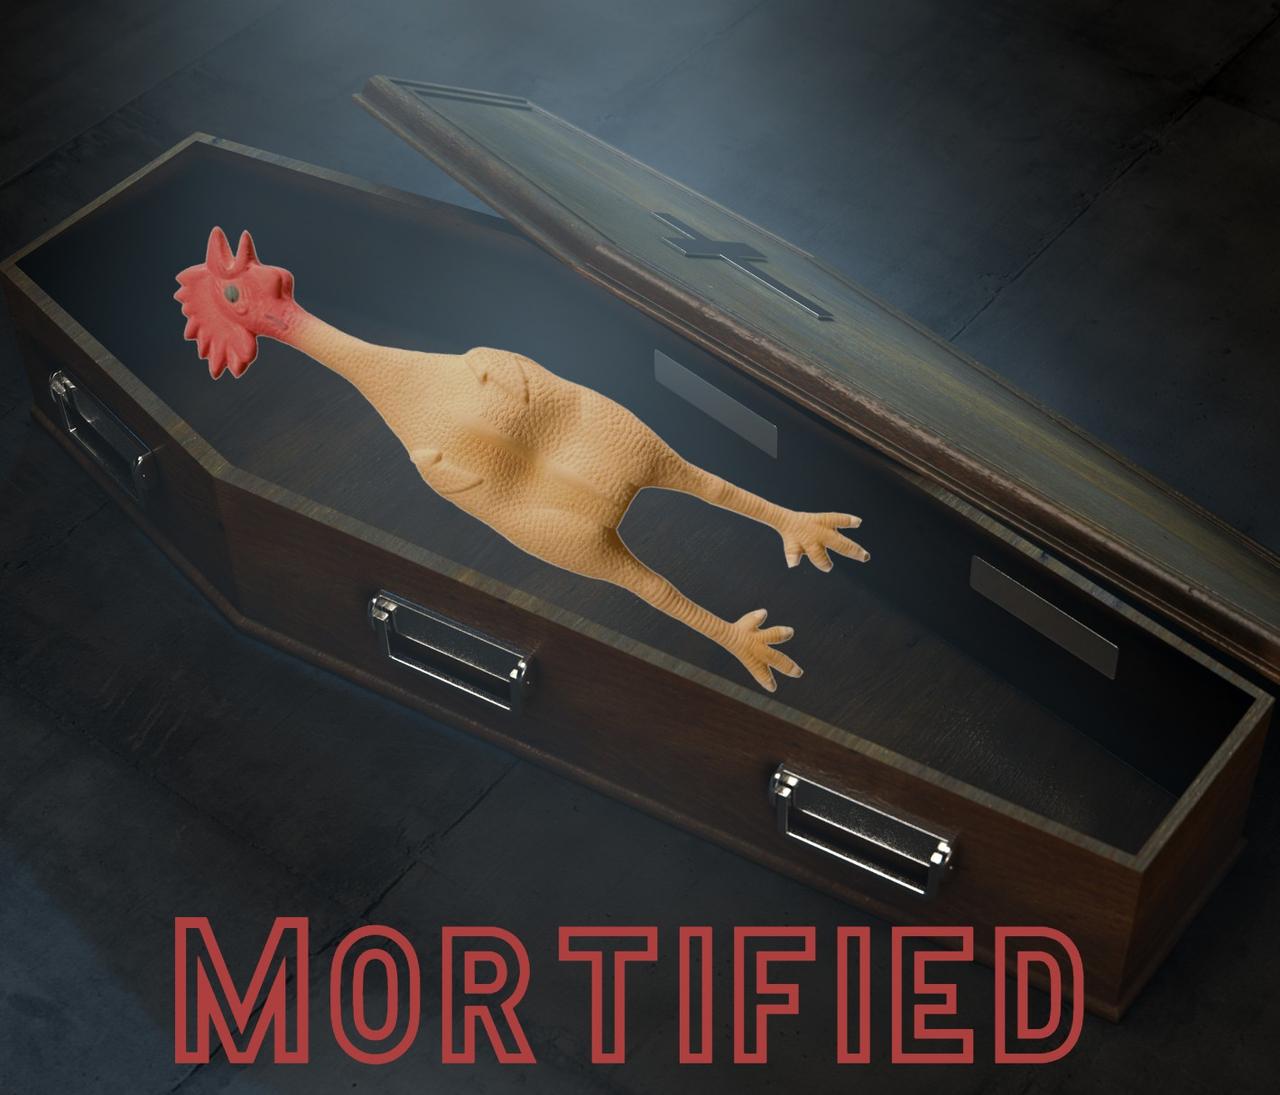 Mortified